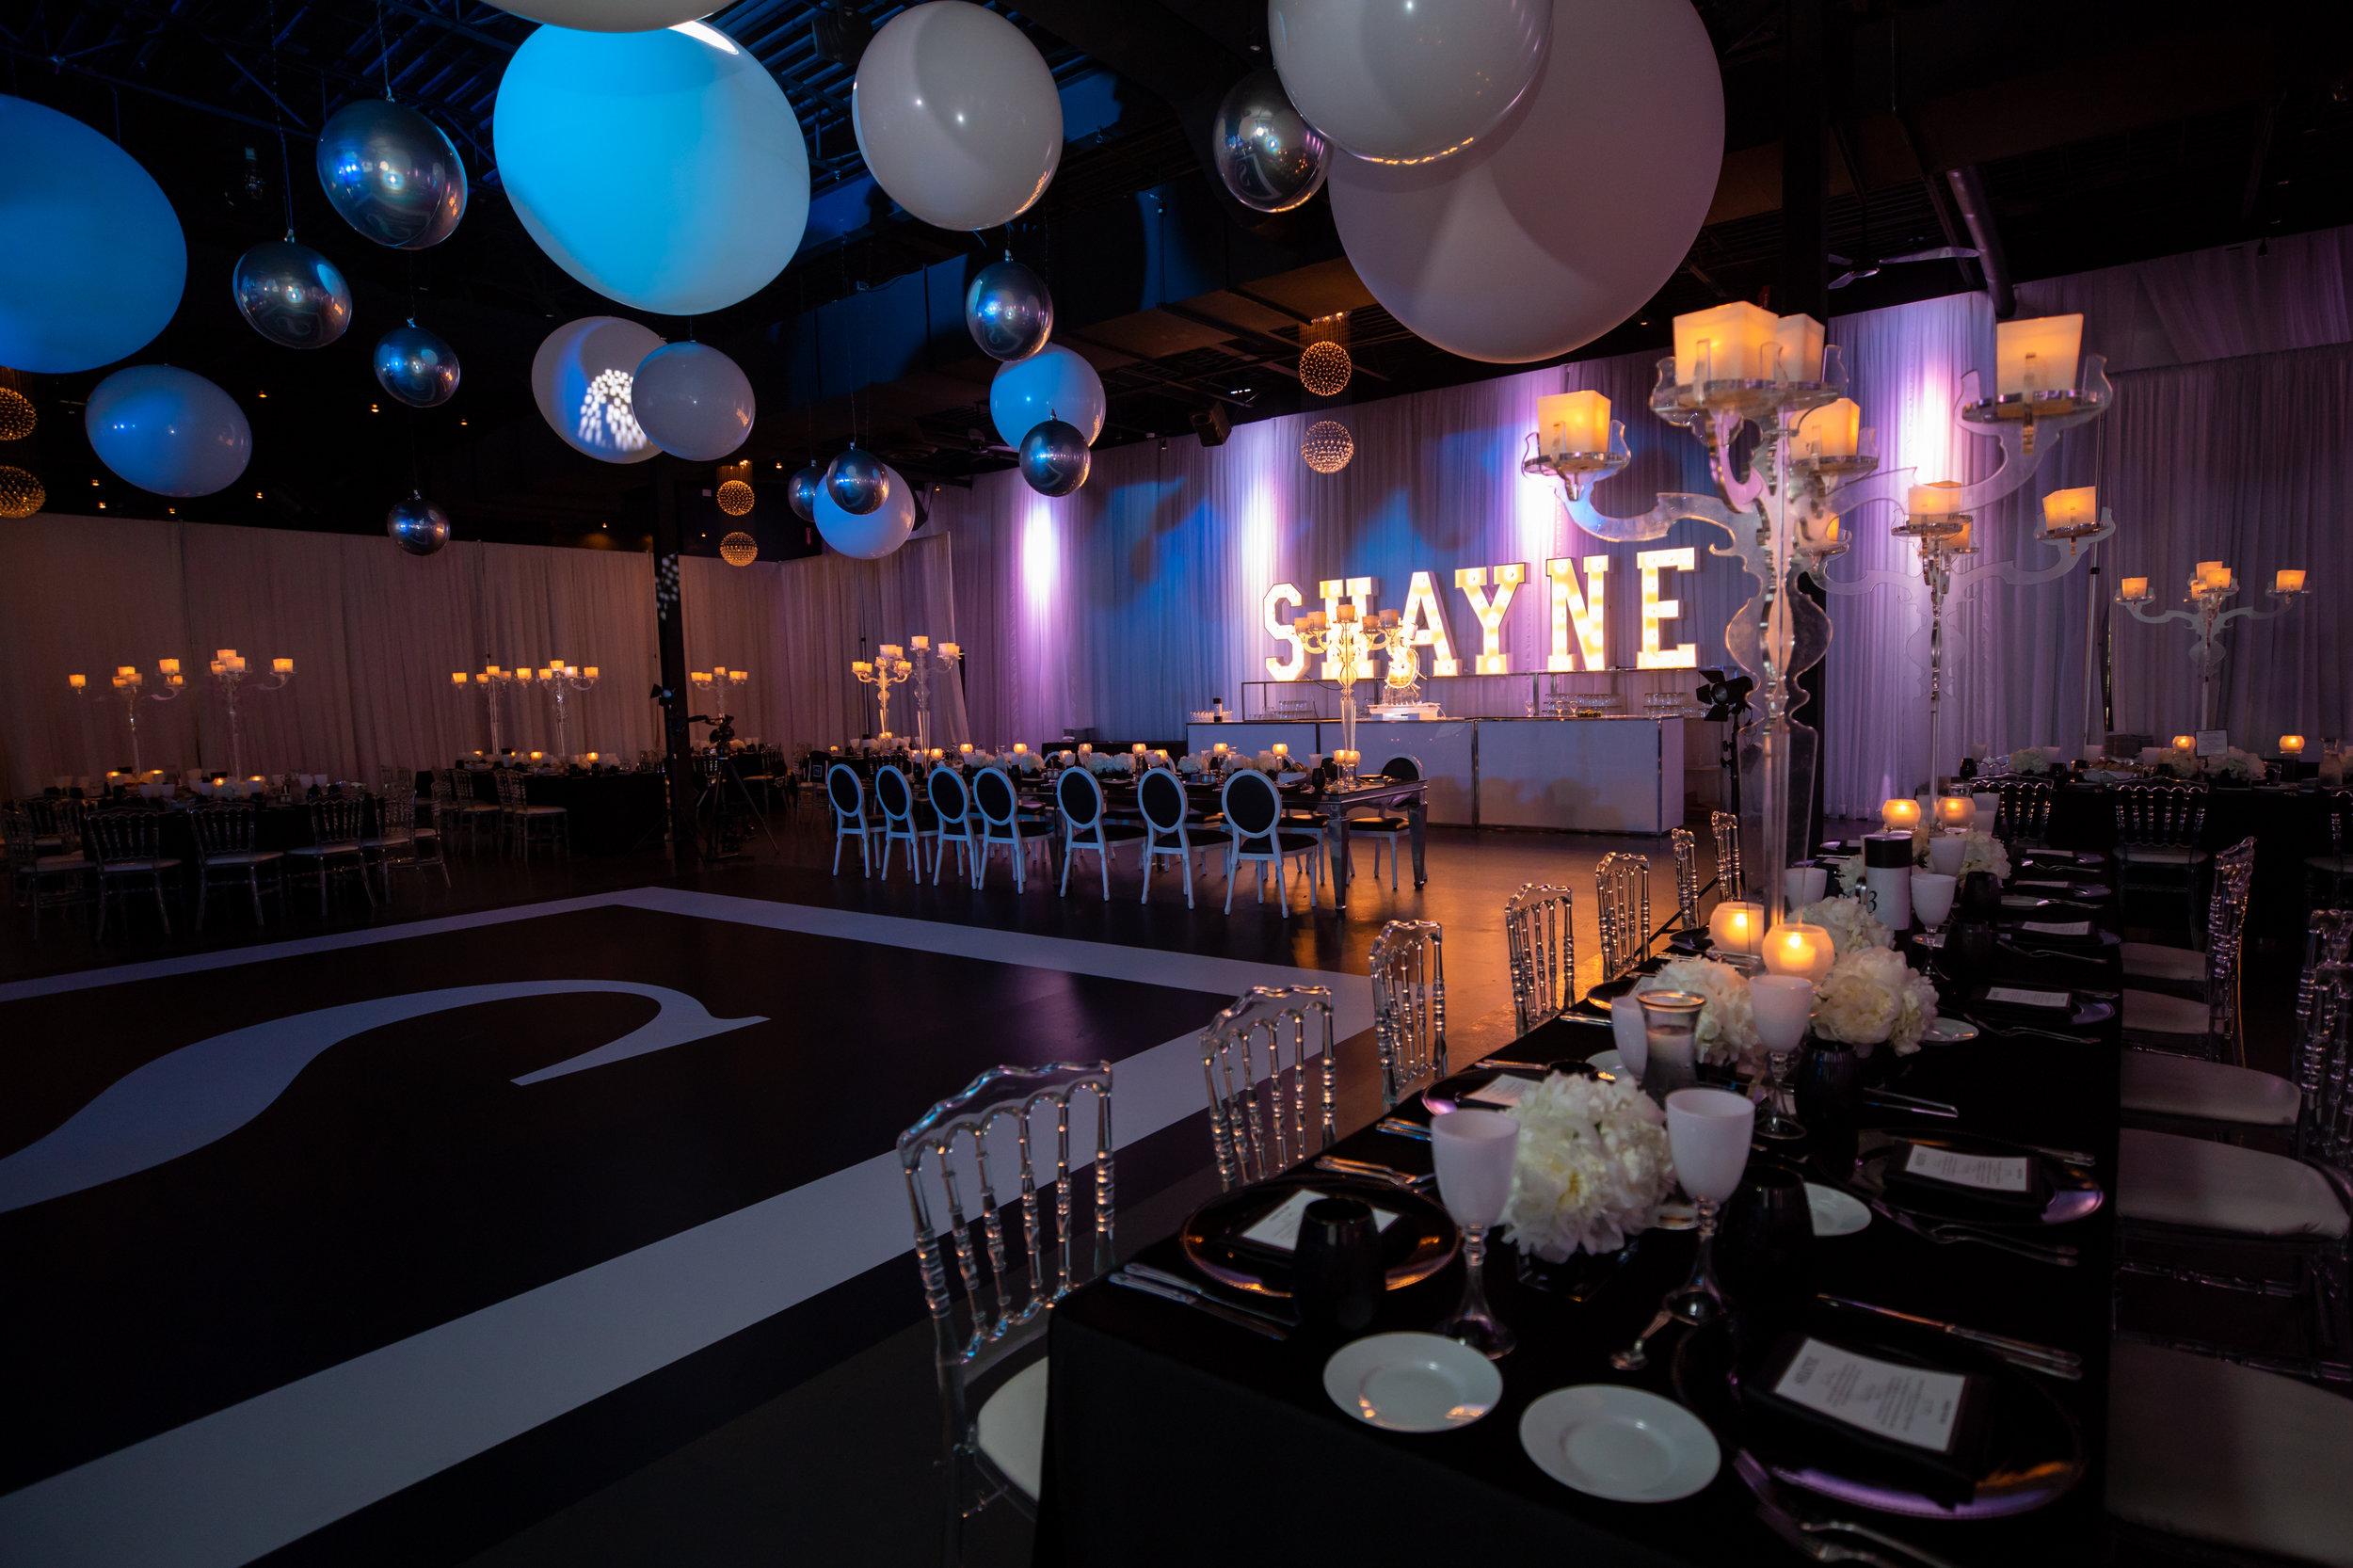 Shayne - Party-0361.jpg